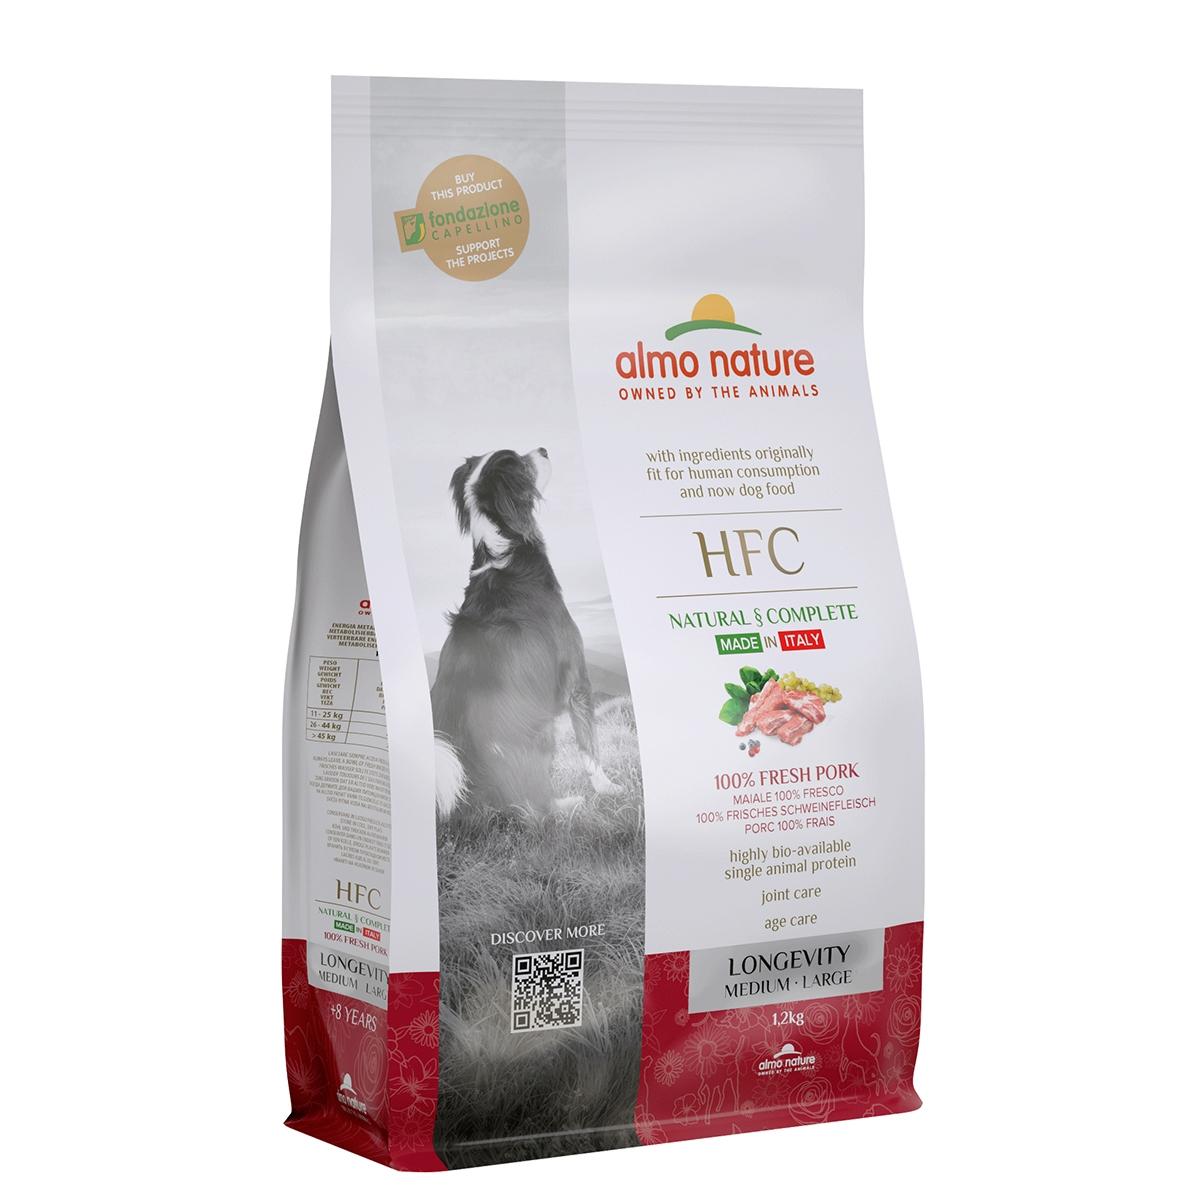 DOG DRY HFC ADULT MED-LAR LONGEVITY CERDO